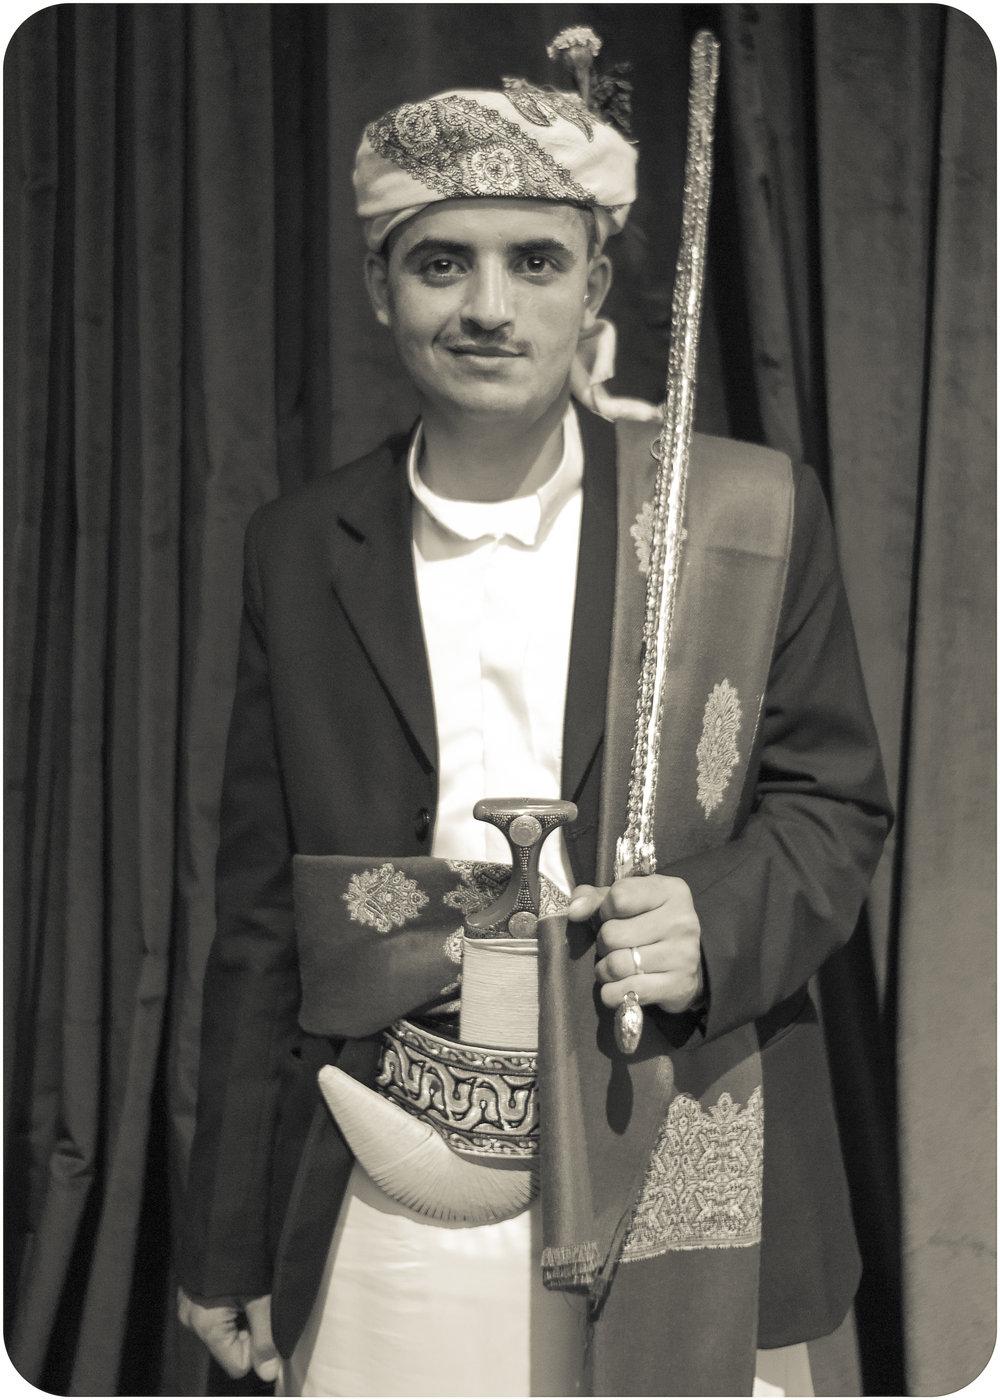 Abdul Salam Mahdi Hameed